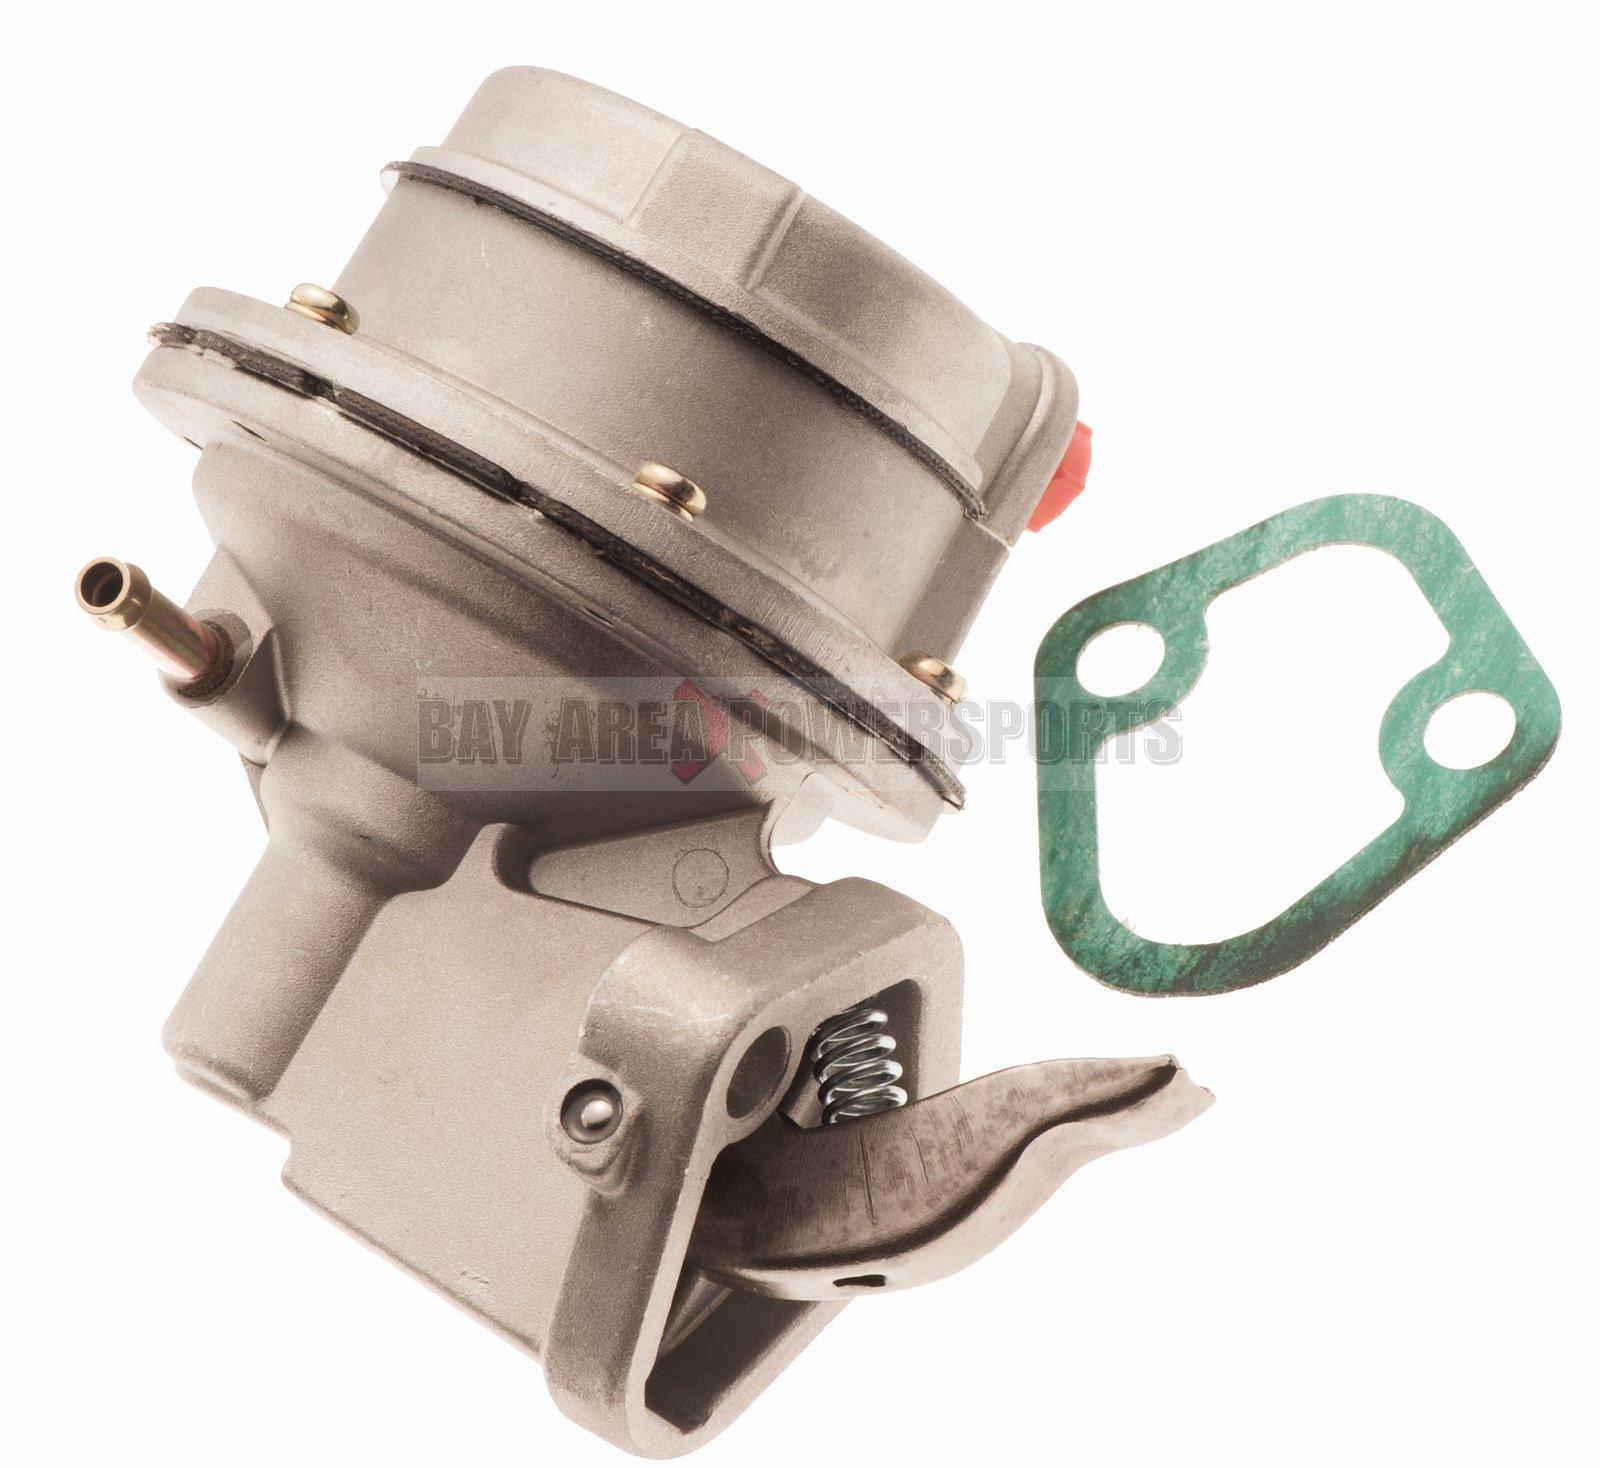 Mercury MerCruiser Fuel Pump 97401A8 97401A2 861678A1 18-7283